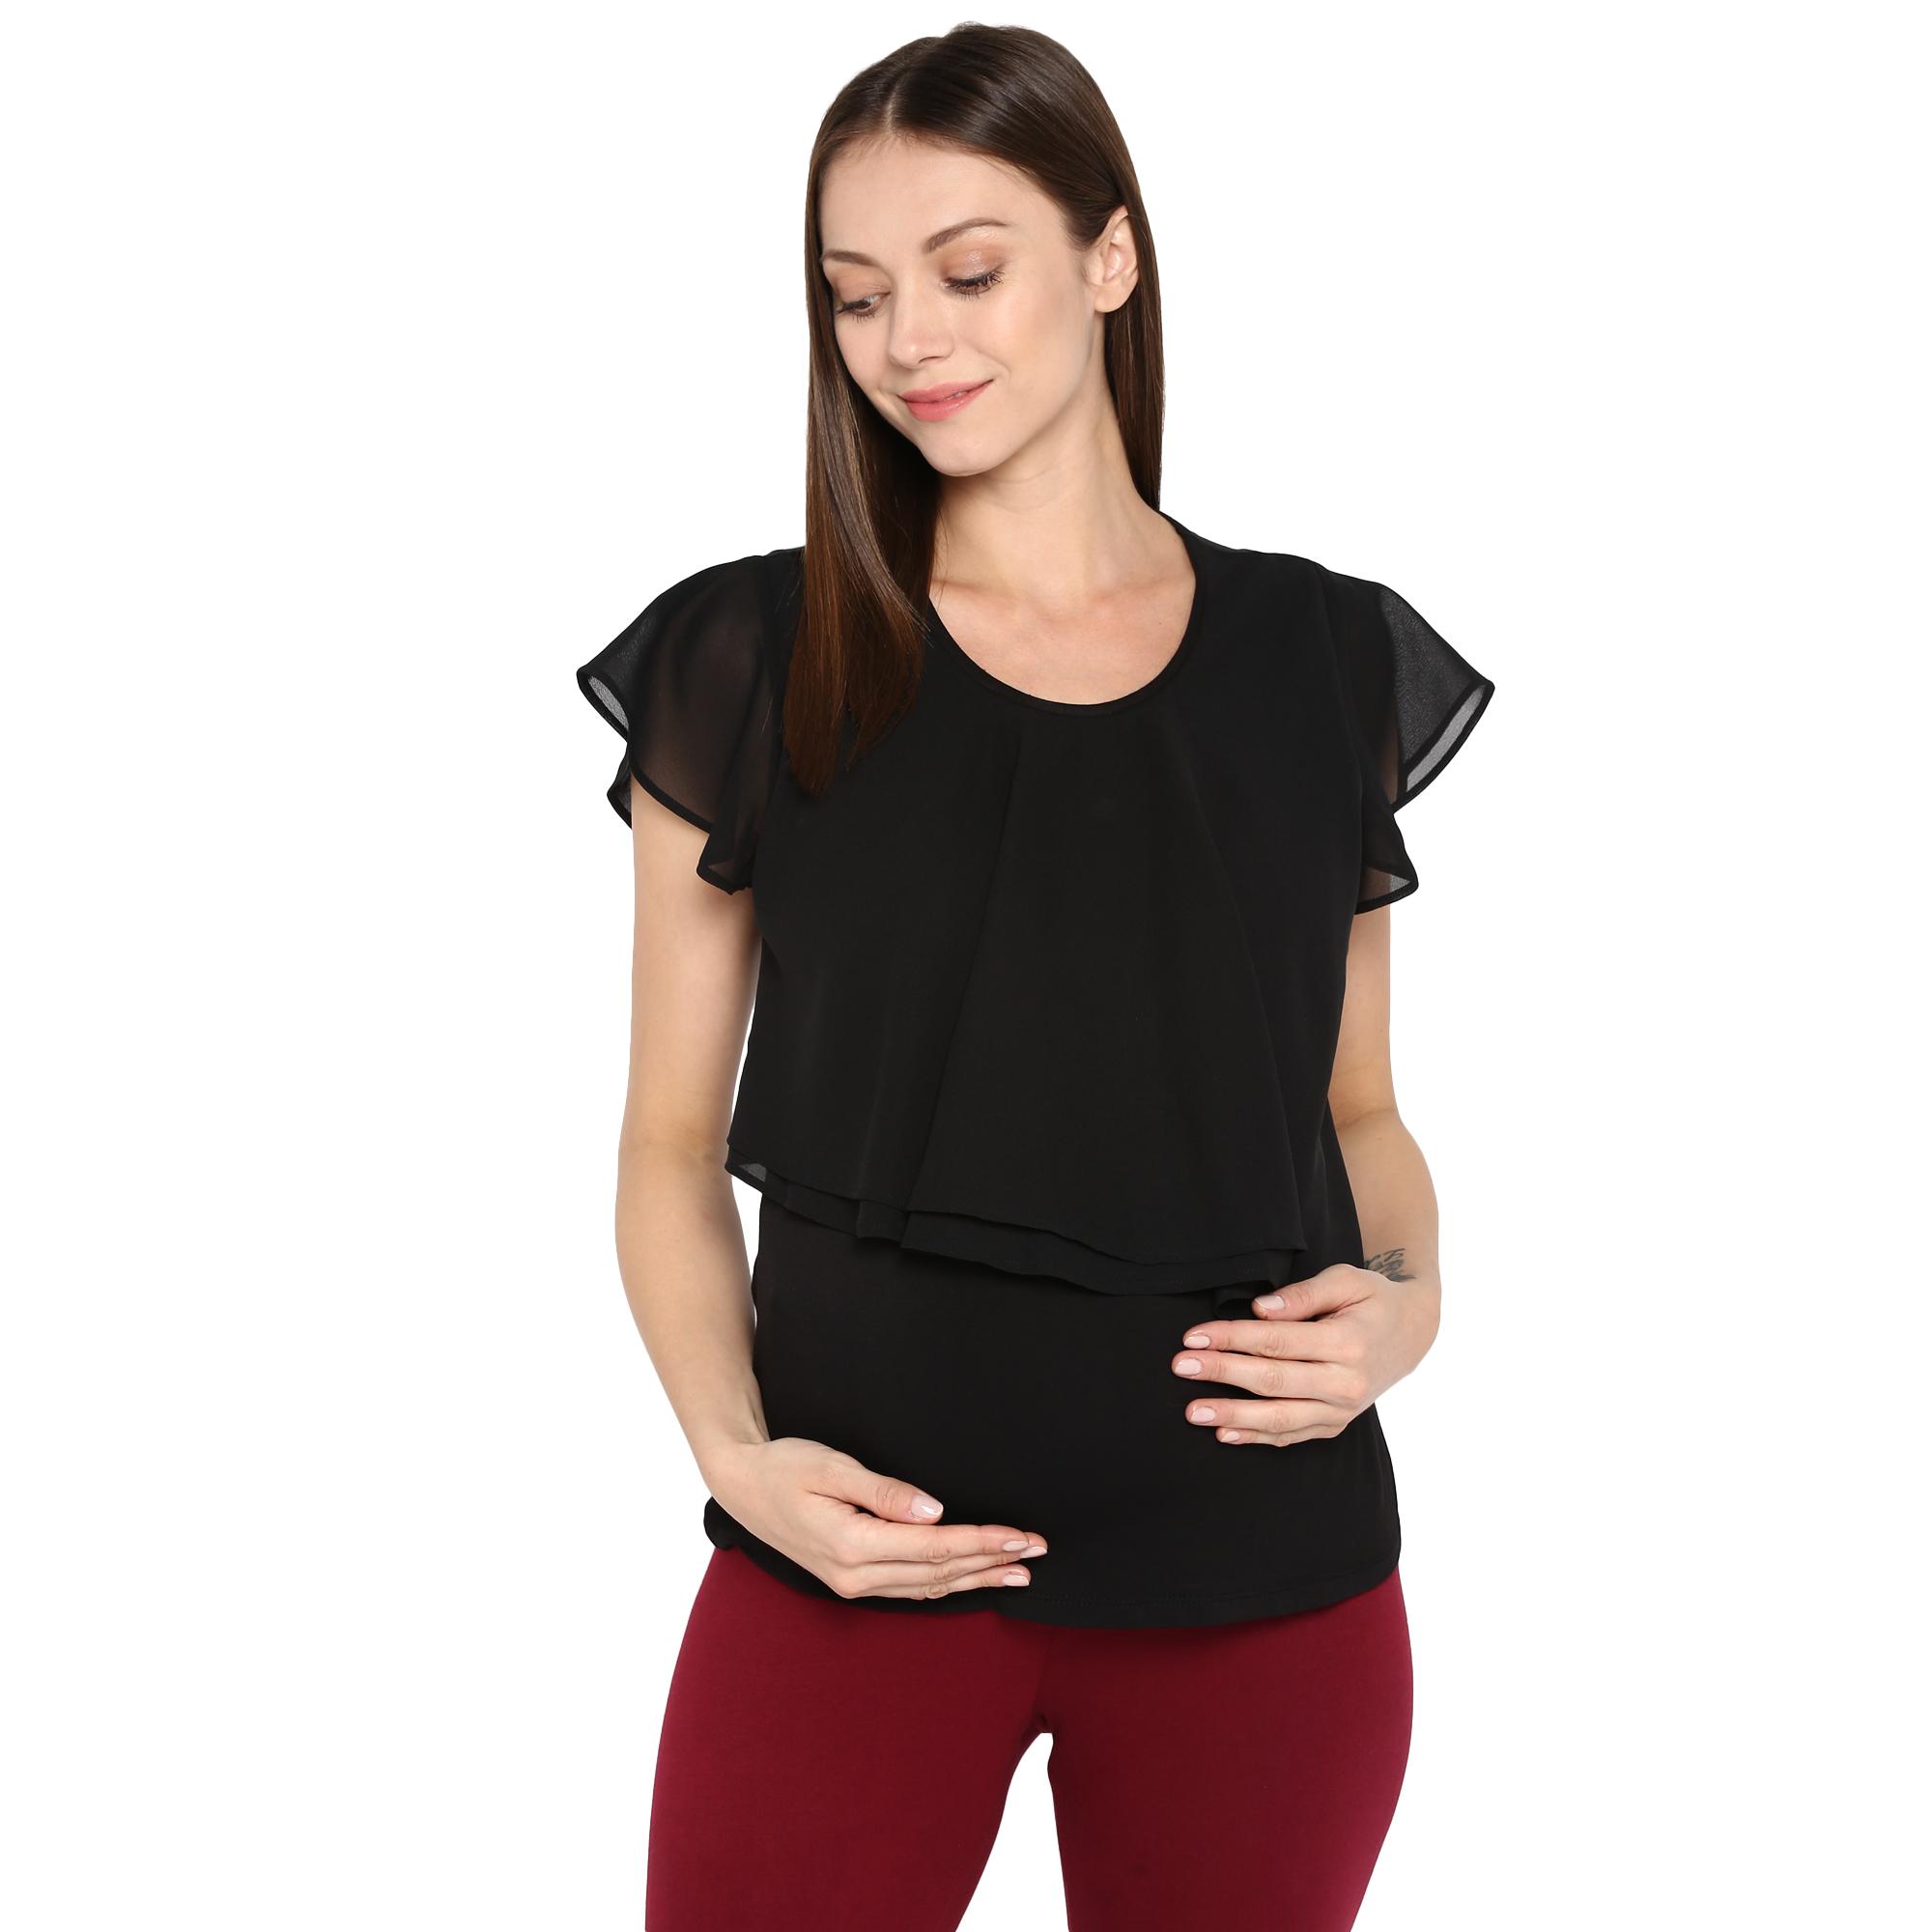 Mothercare   Women Maternity Half Sleeves Top - Black